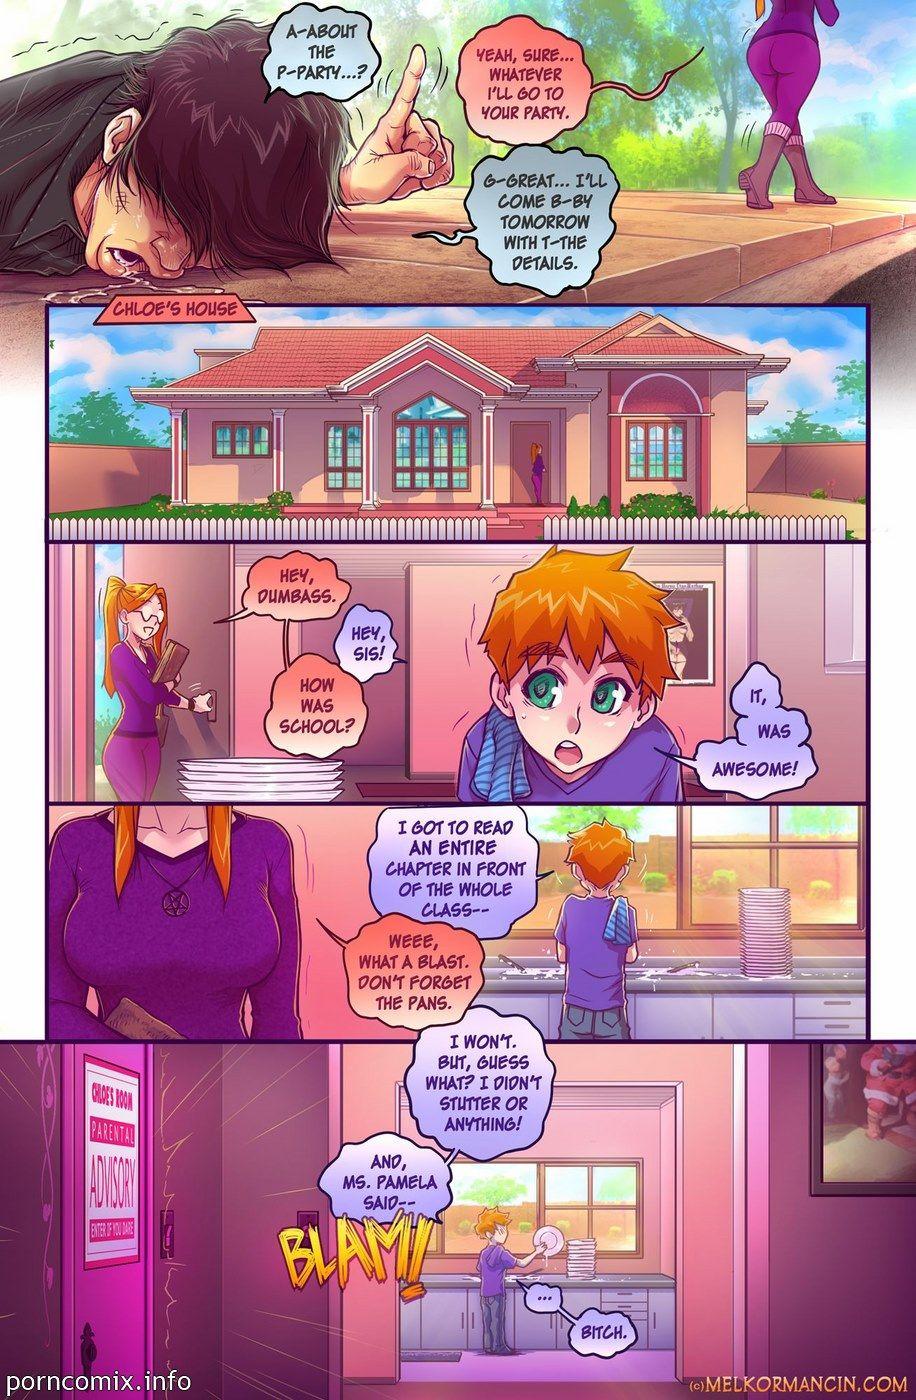 Melkormancin – Sidney 3- Chloe